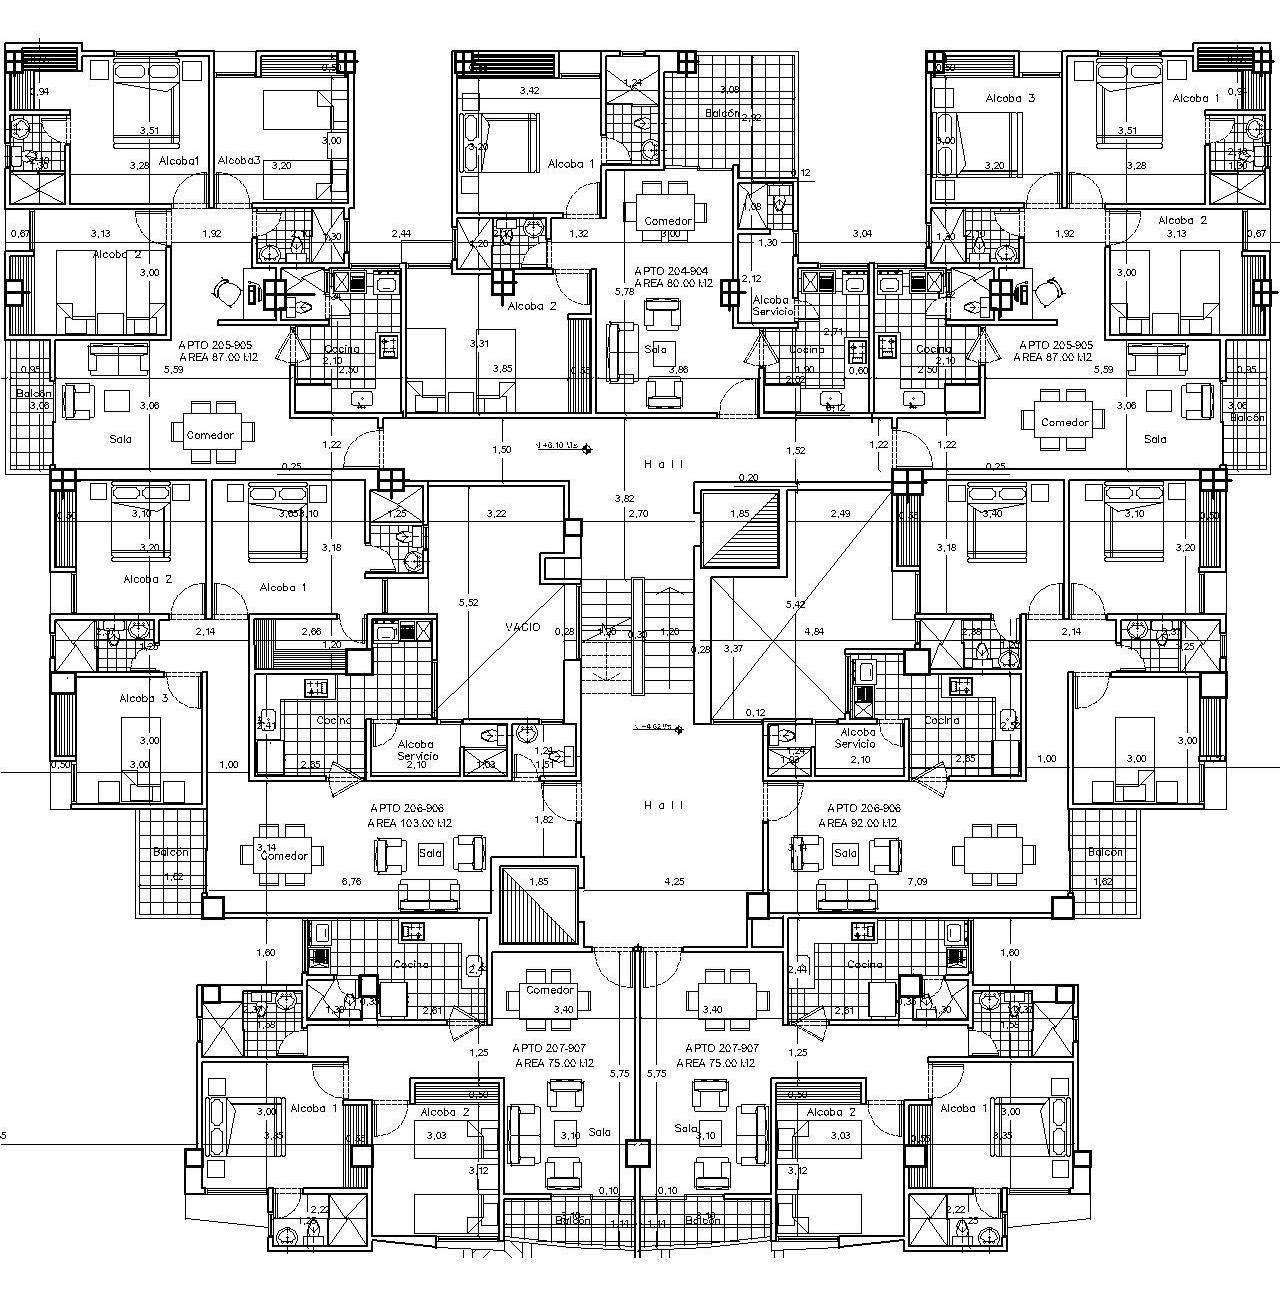 Edificio palmeiras planos generales for Edificio de departamentos planos